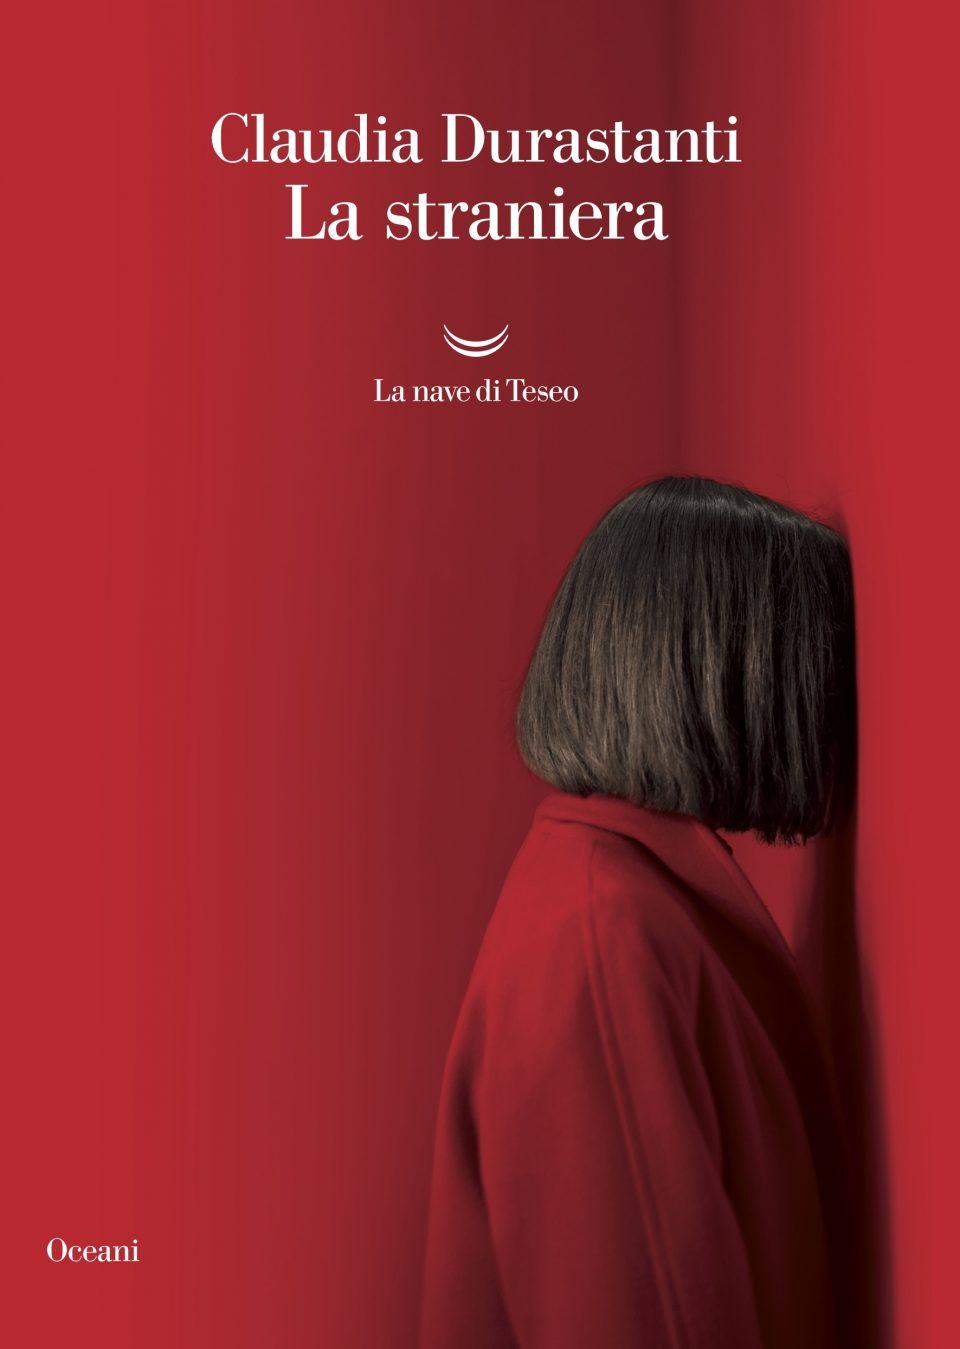 Claudia Durastanti la straniera